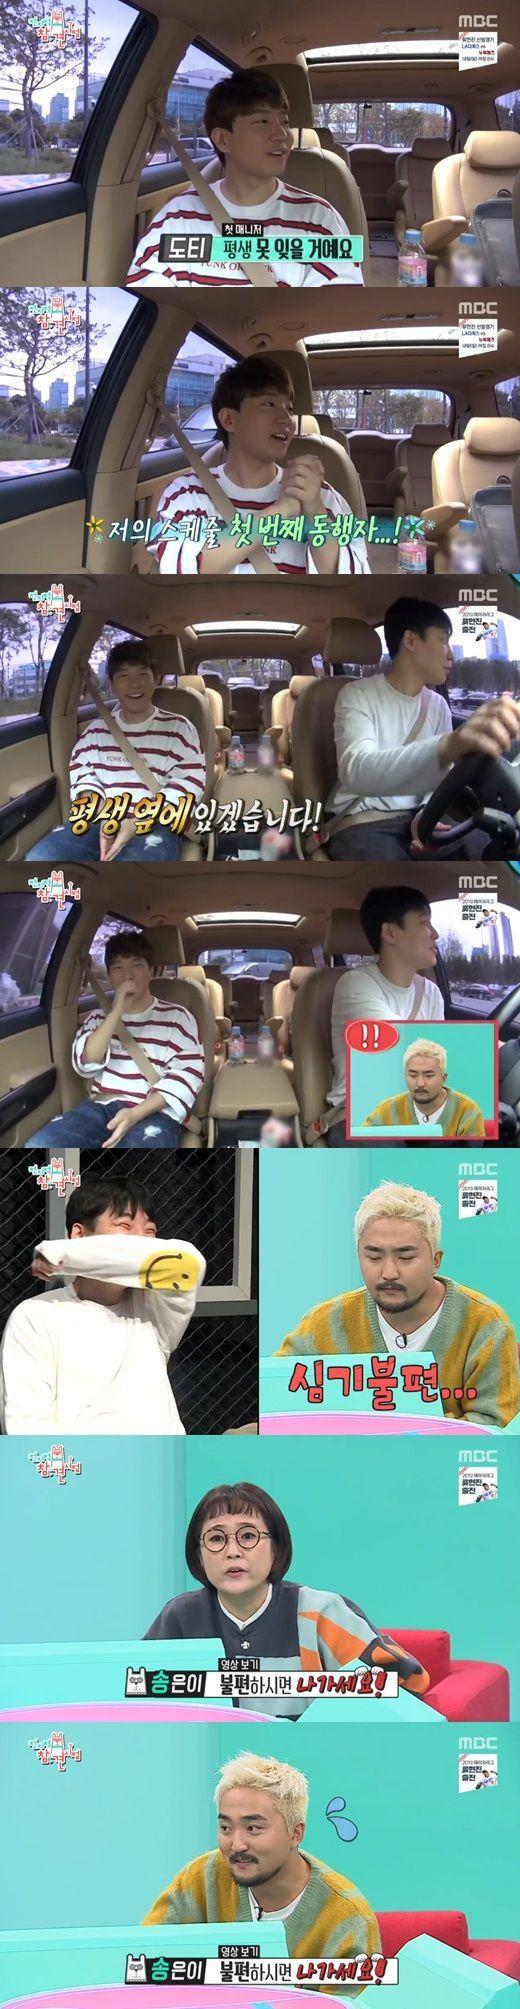 MBC '전지적 참견 시점' 유튜버 도티와 코미디언 유병재 / 사진=MBC